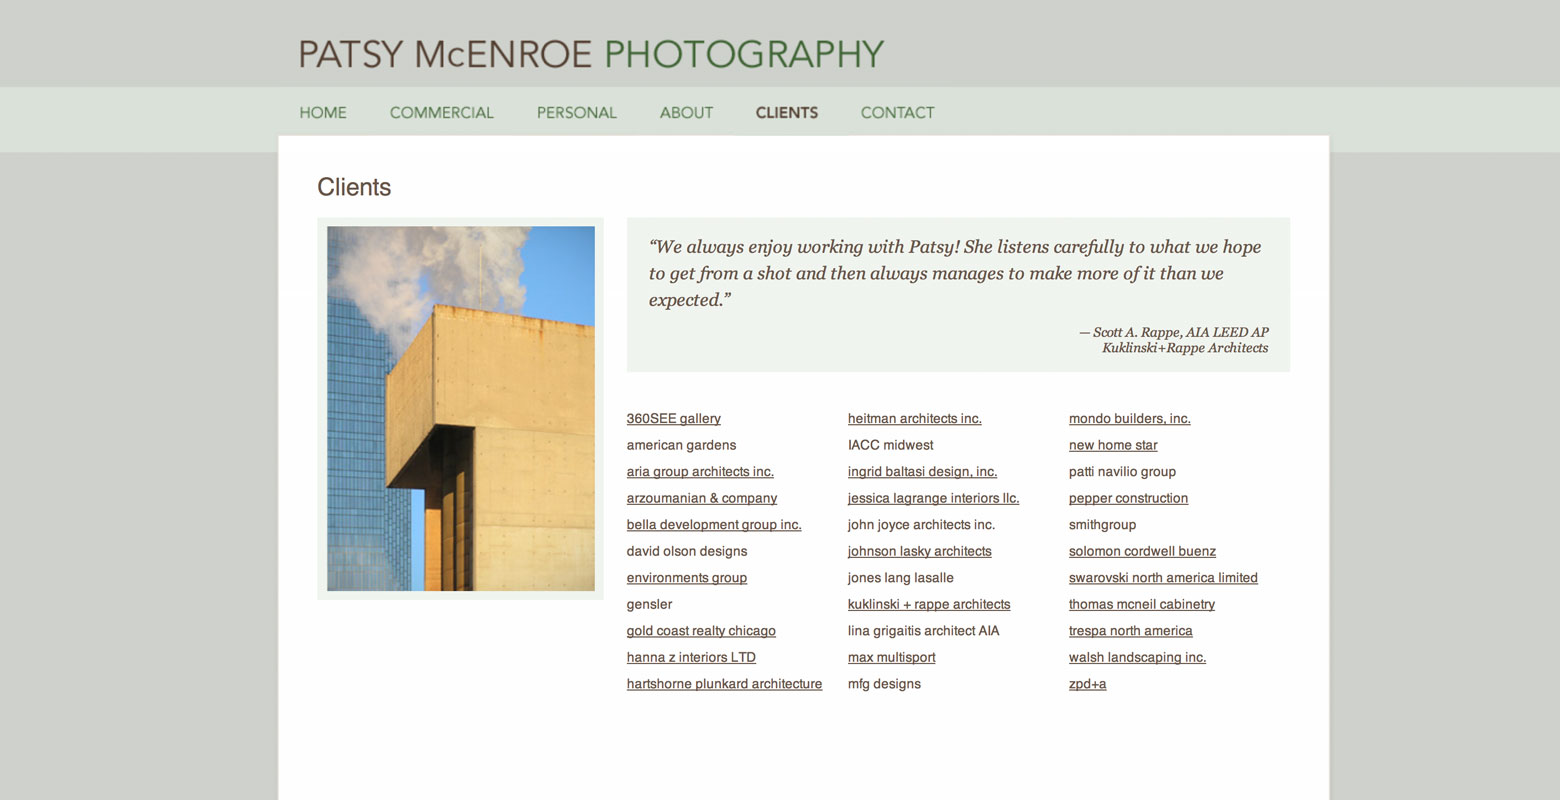 Patsy McEnroe Photography